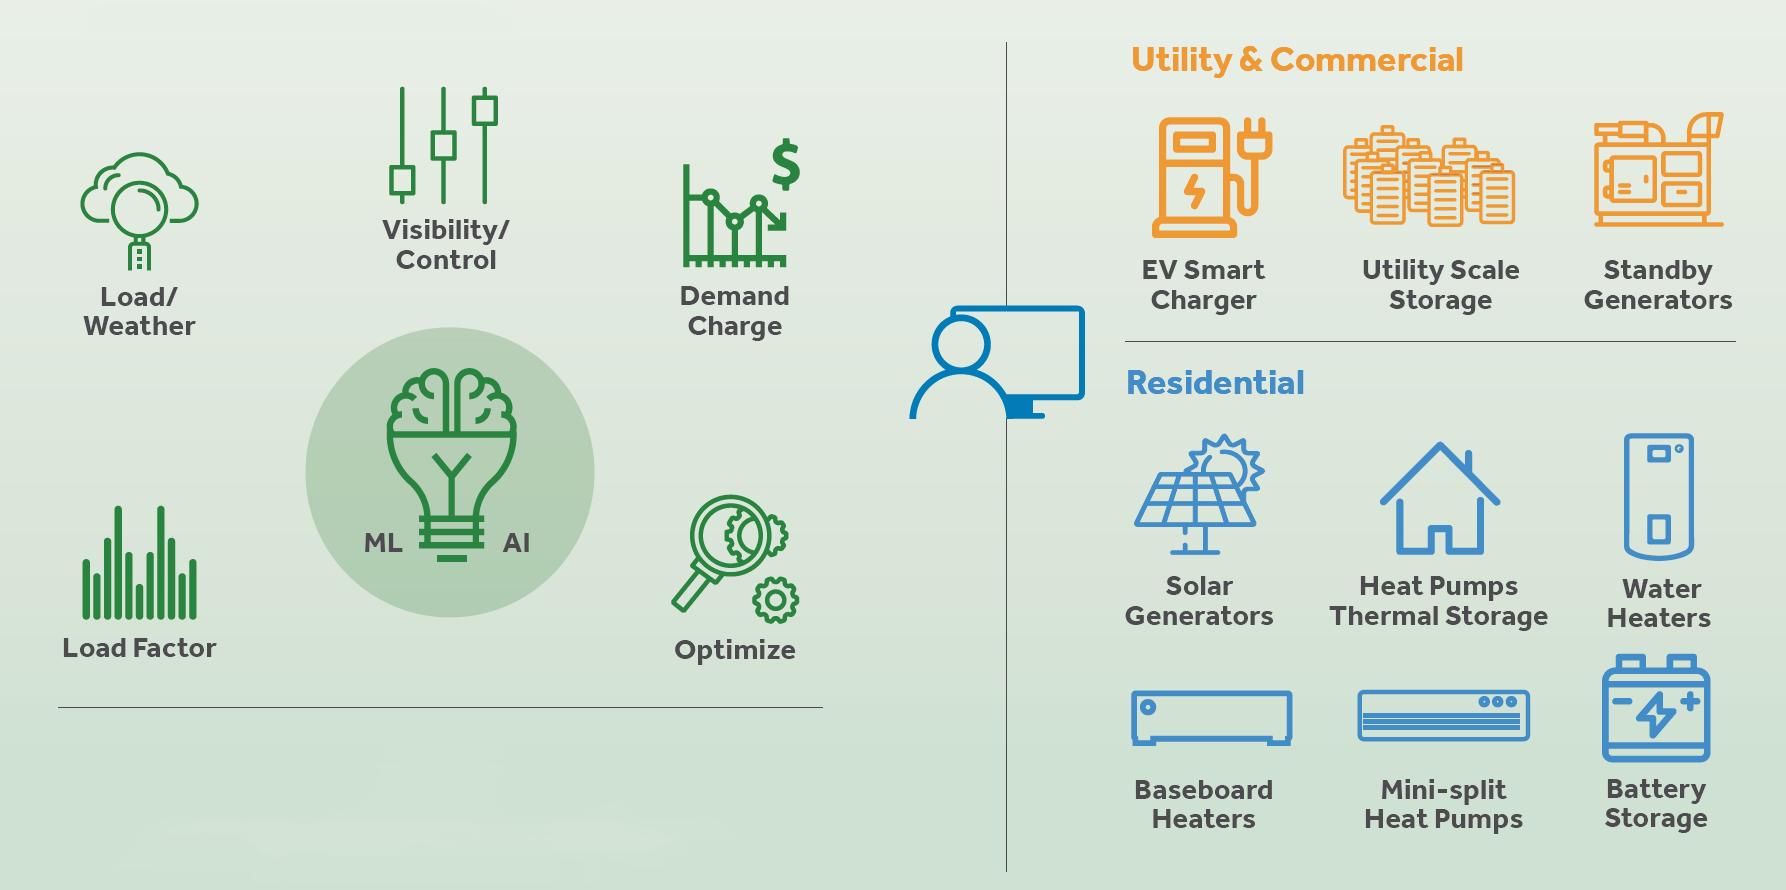 smart-energy-diagram-green.png